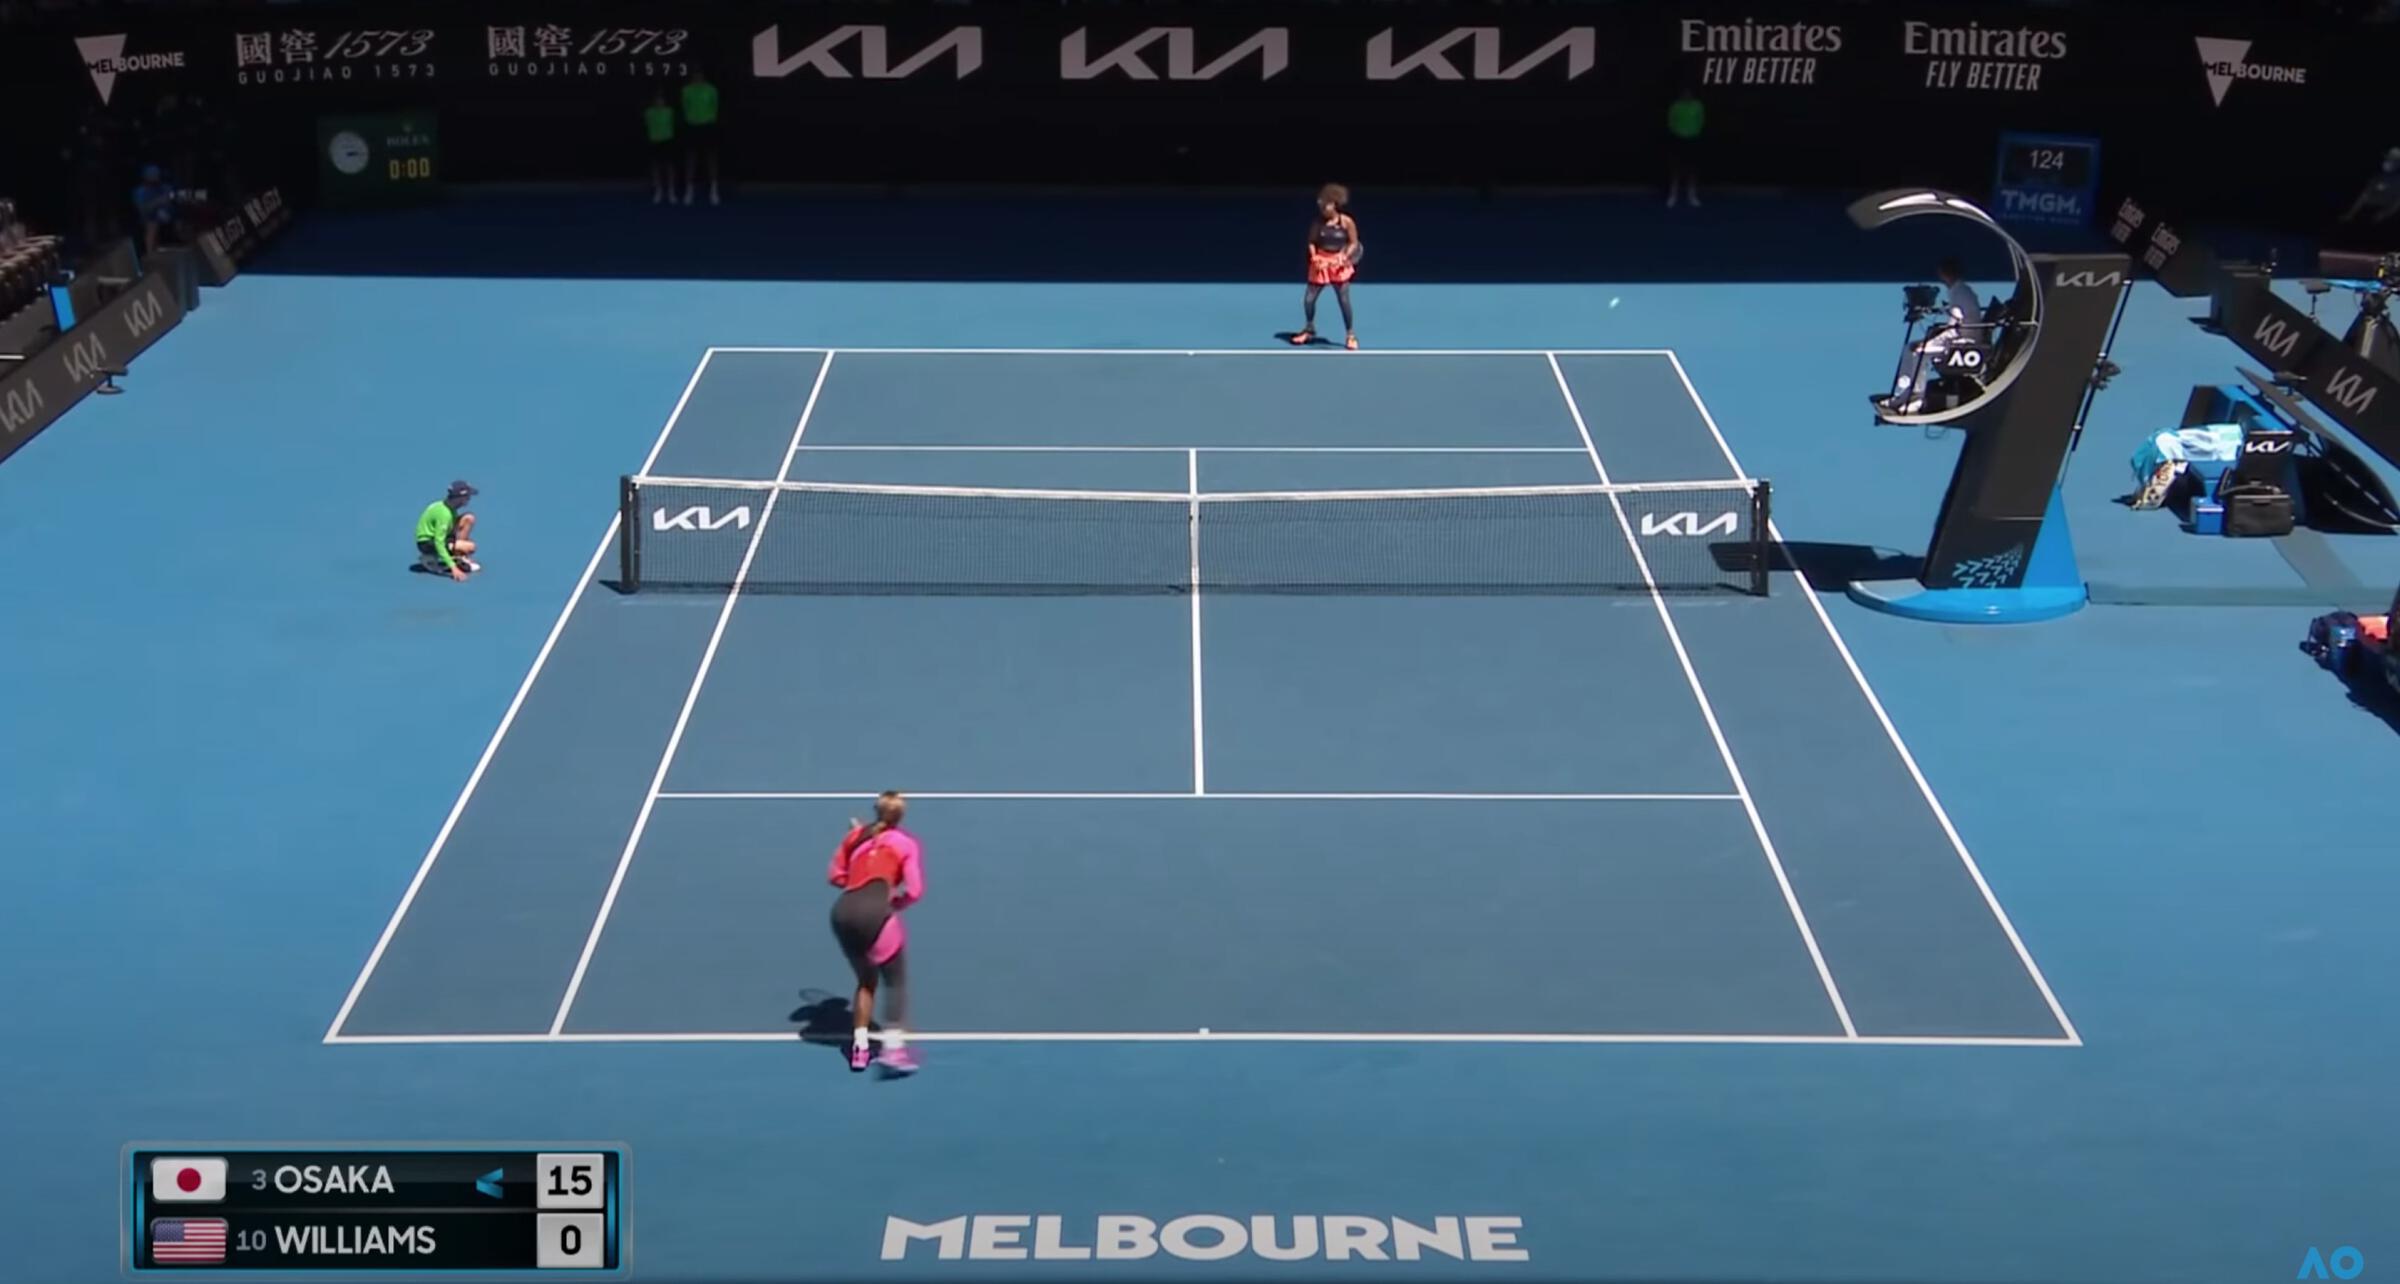 https://www.naomiosaka.com/wp-content/uploads/2021/05/naomi-tennis-highlights-video.jpg